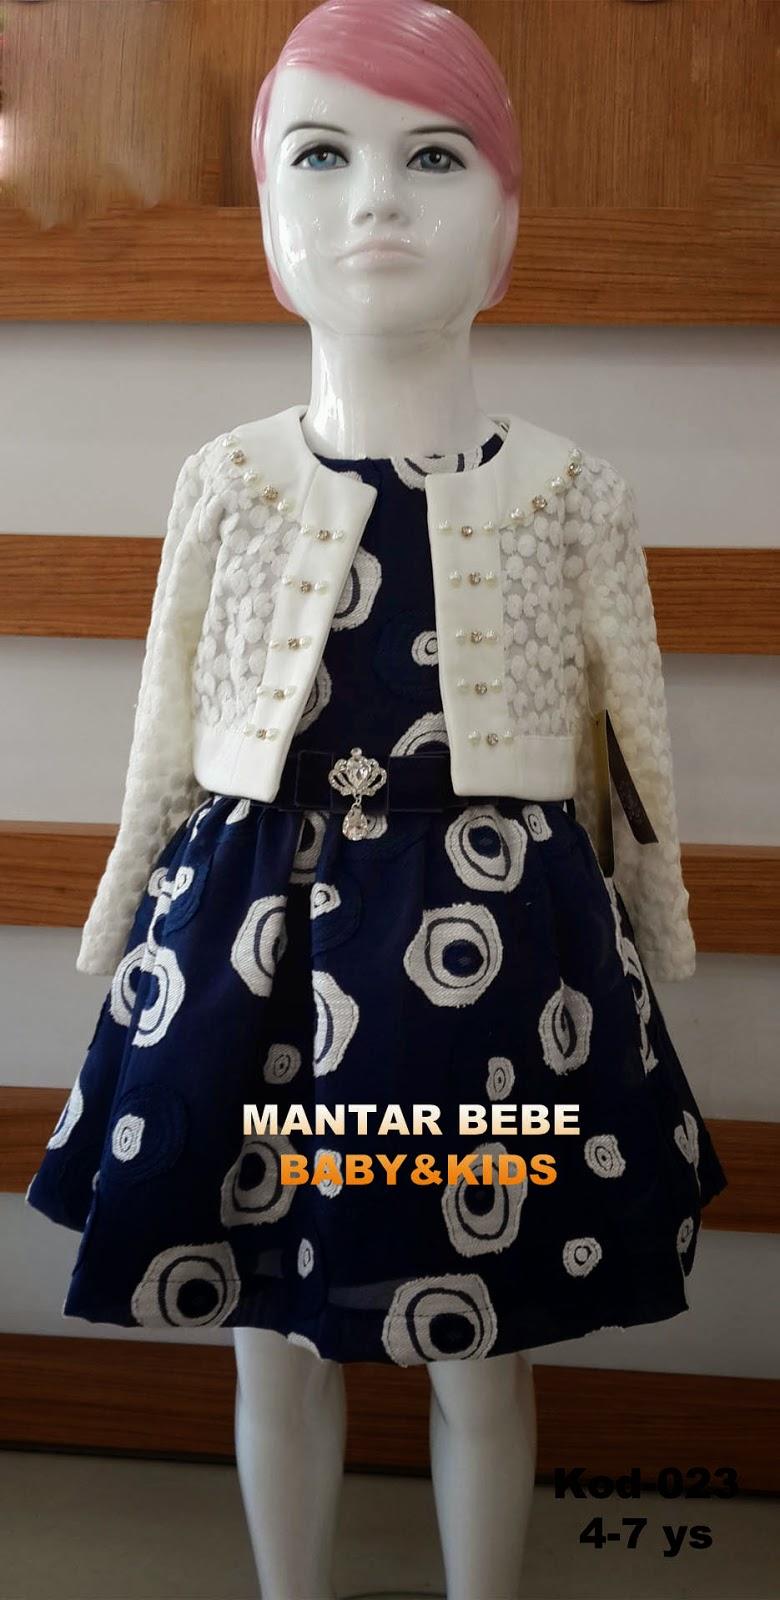 MANTAR BEBE ÇOCUK GİYİM - KOD023